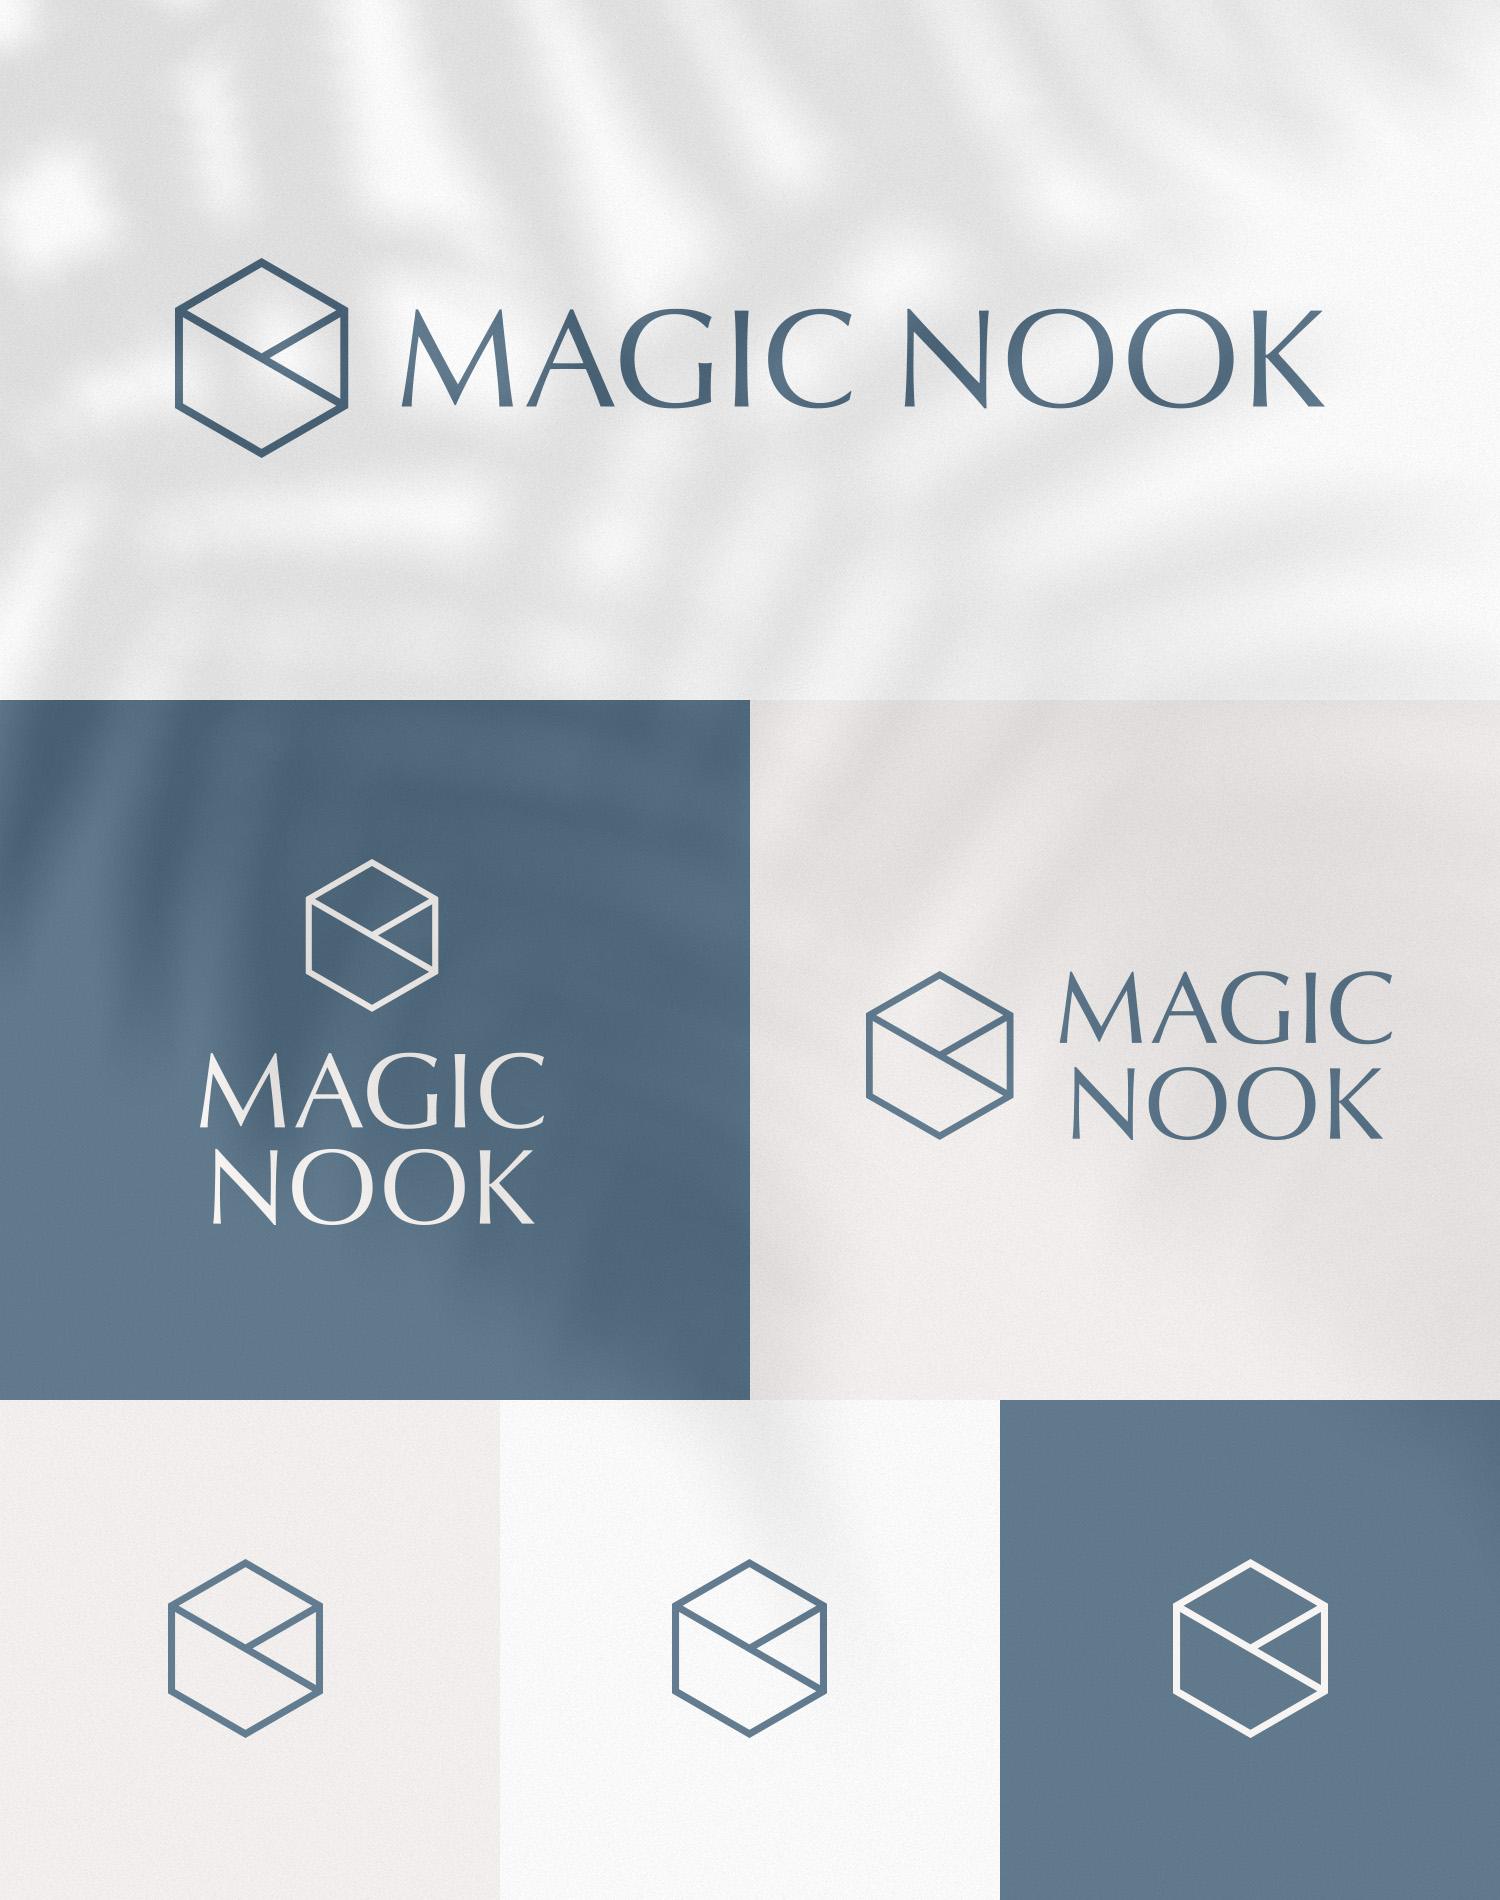 MAGIC NOOK Visual Identity 01 - New logo